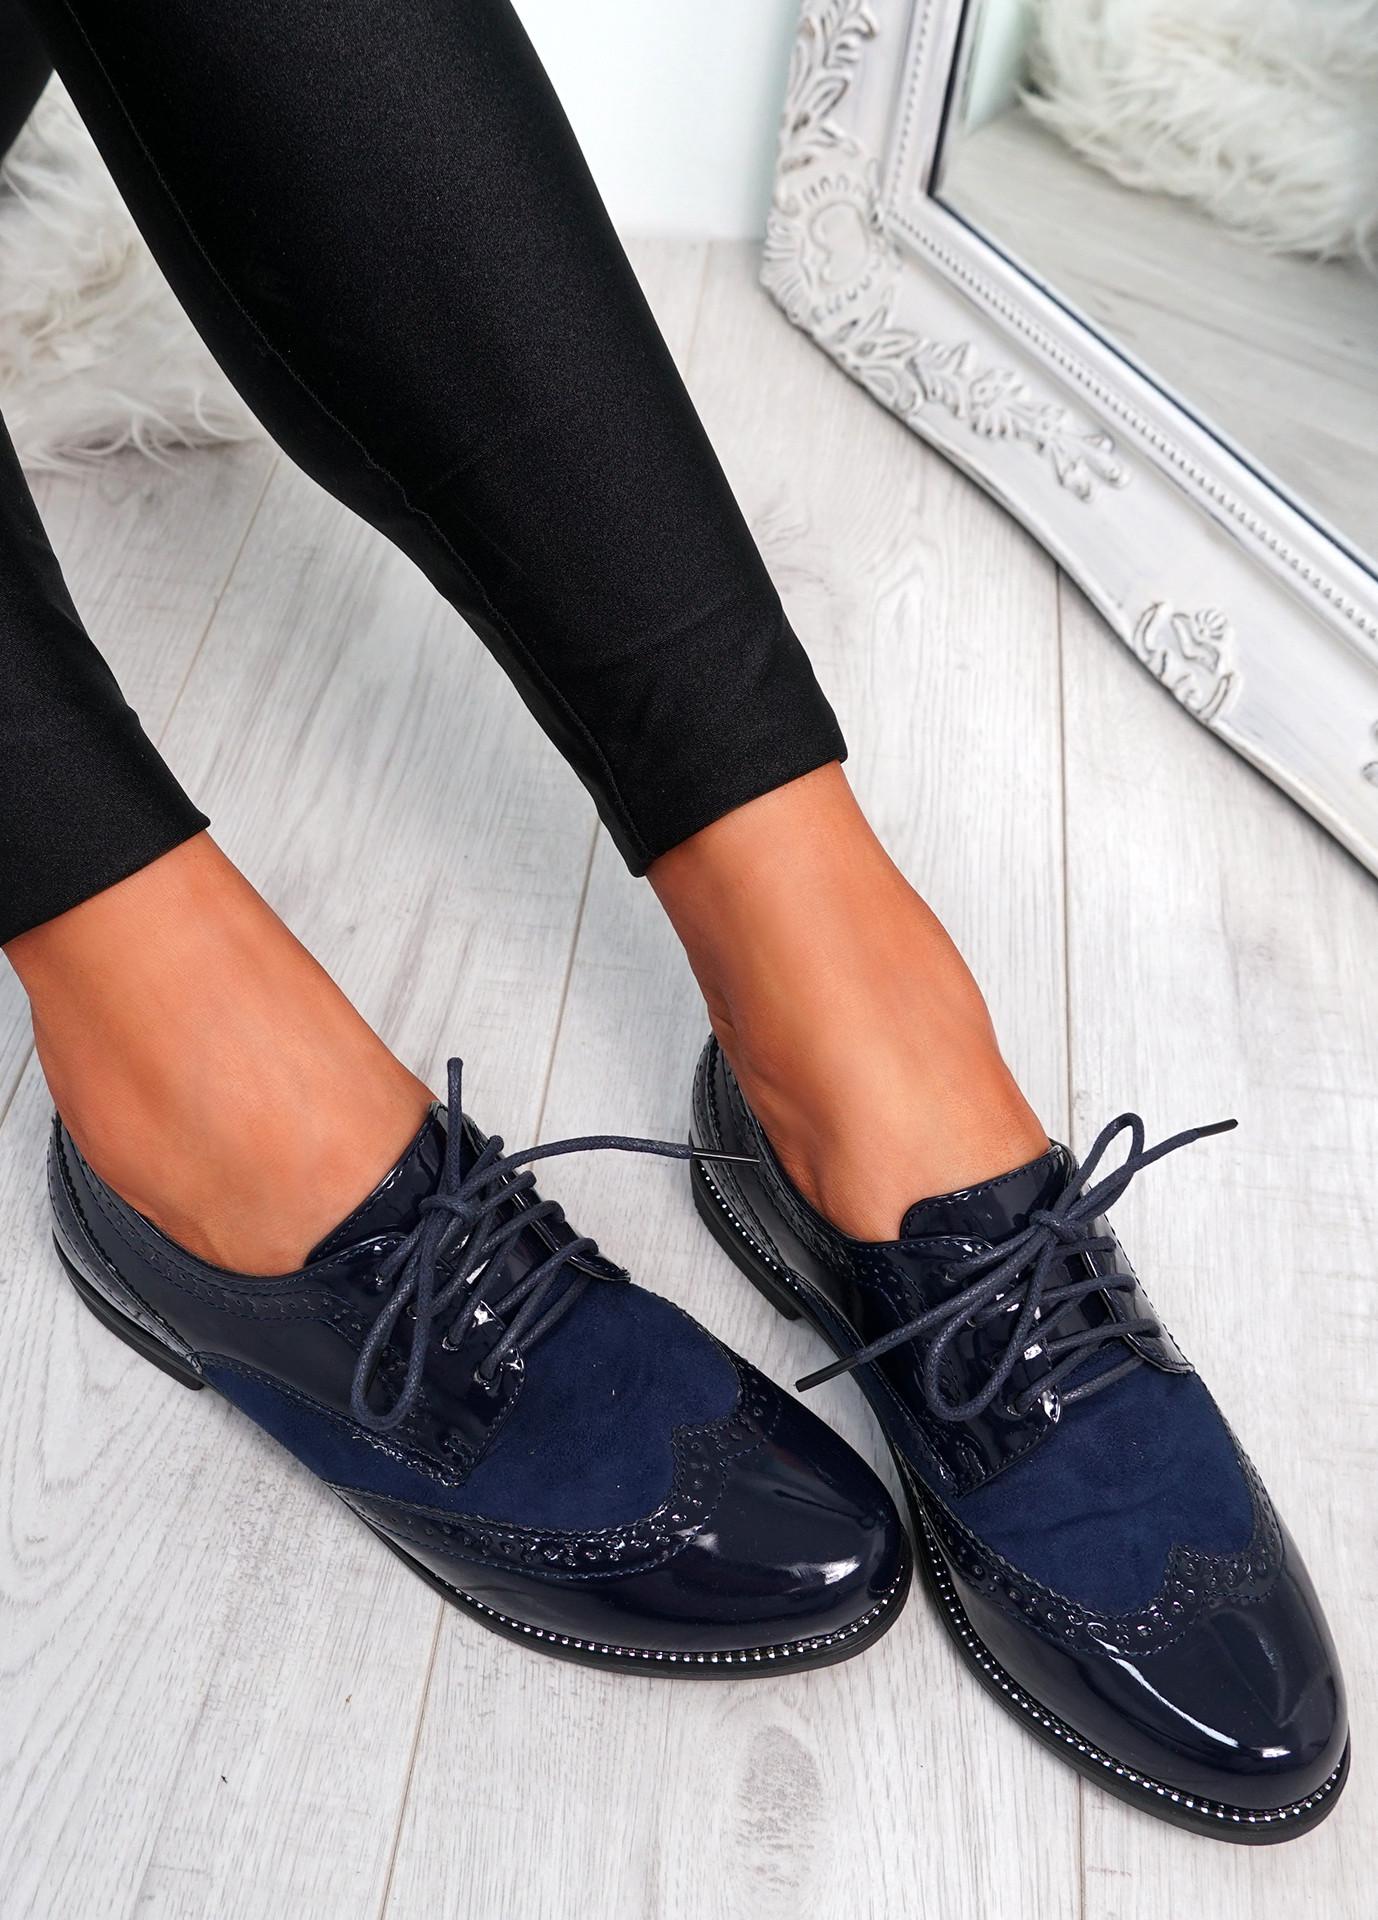 Rommo Blue Oxford Style Ballerinas